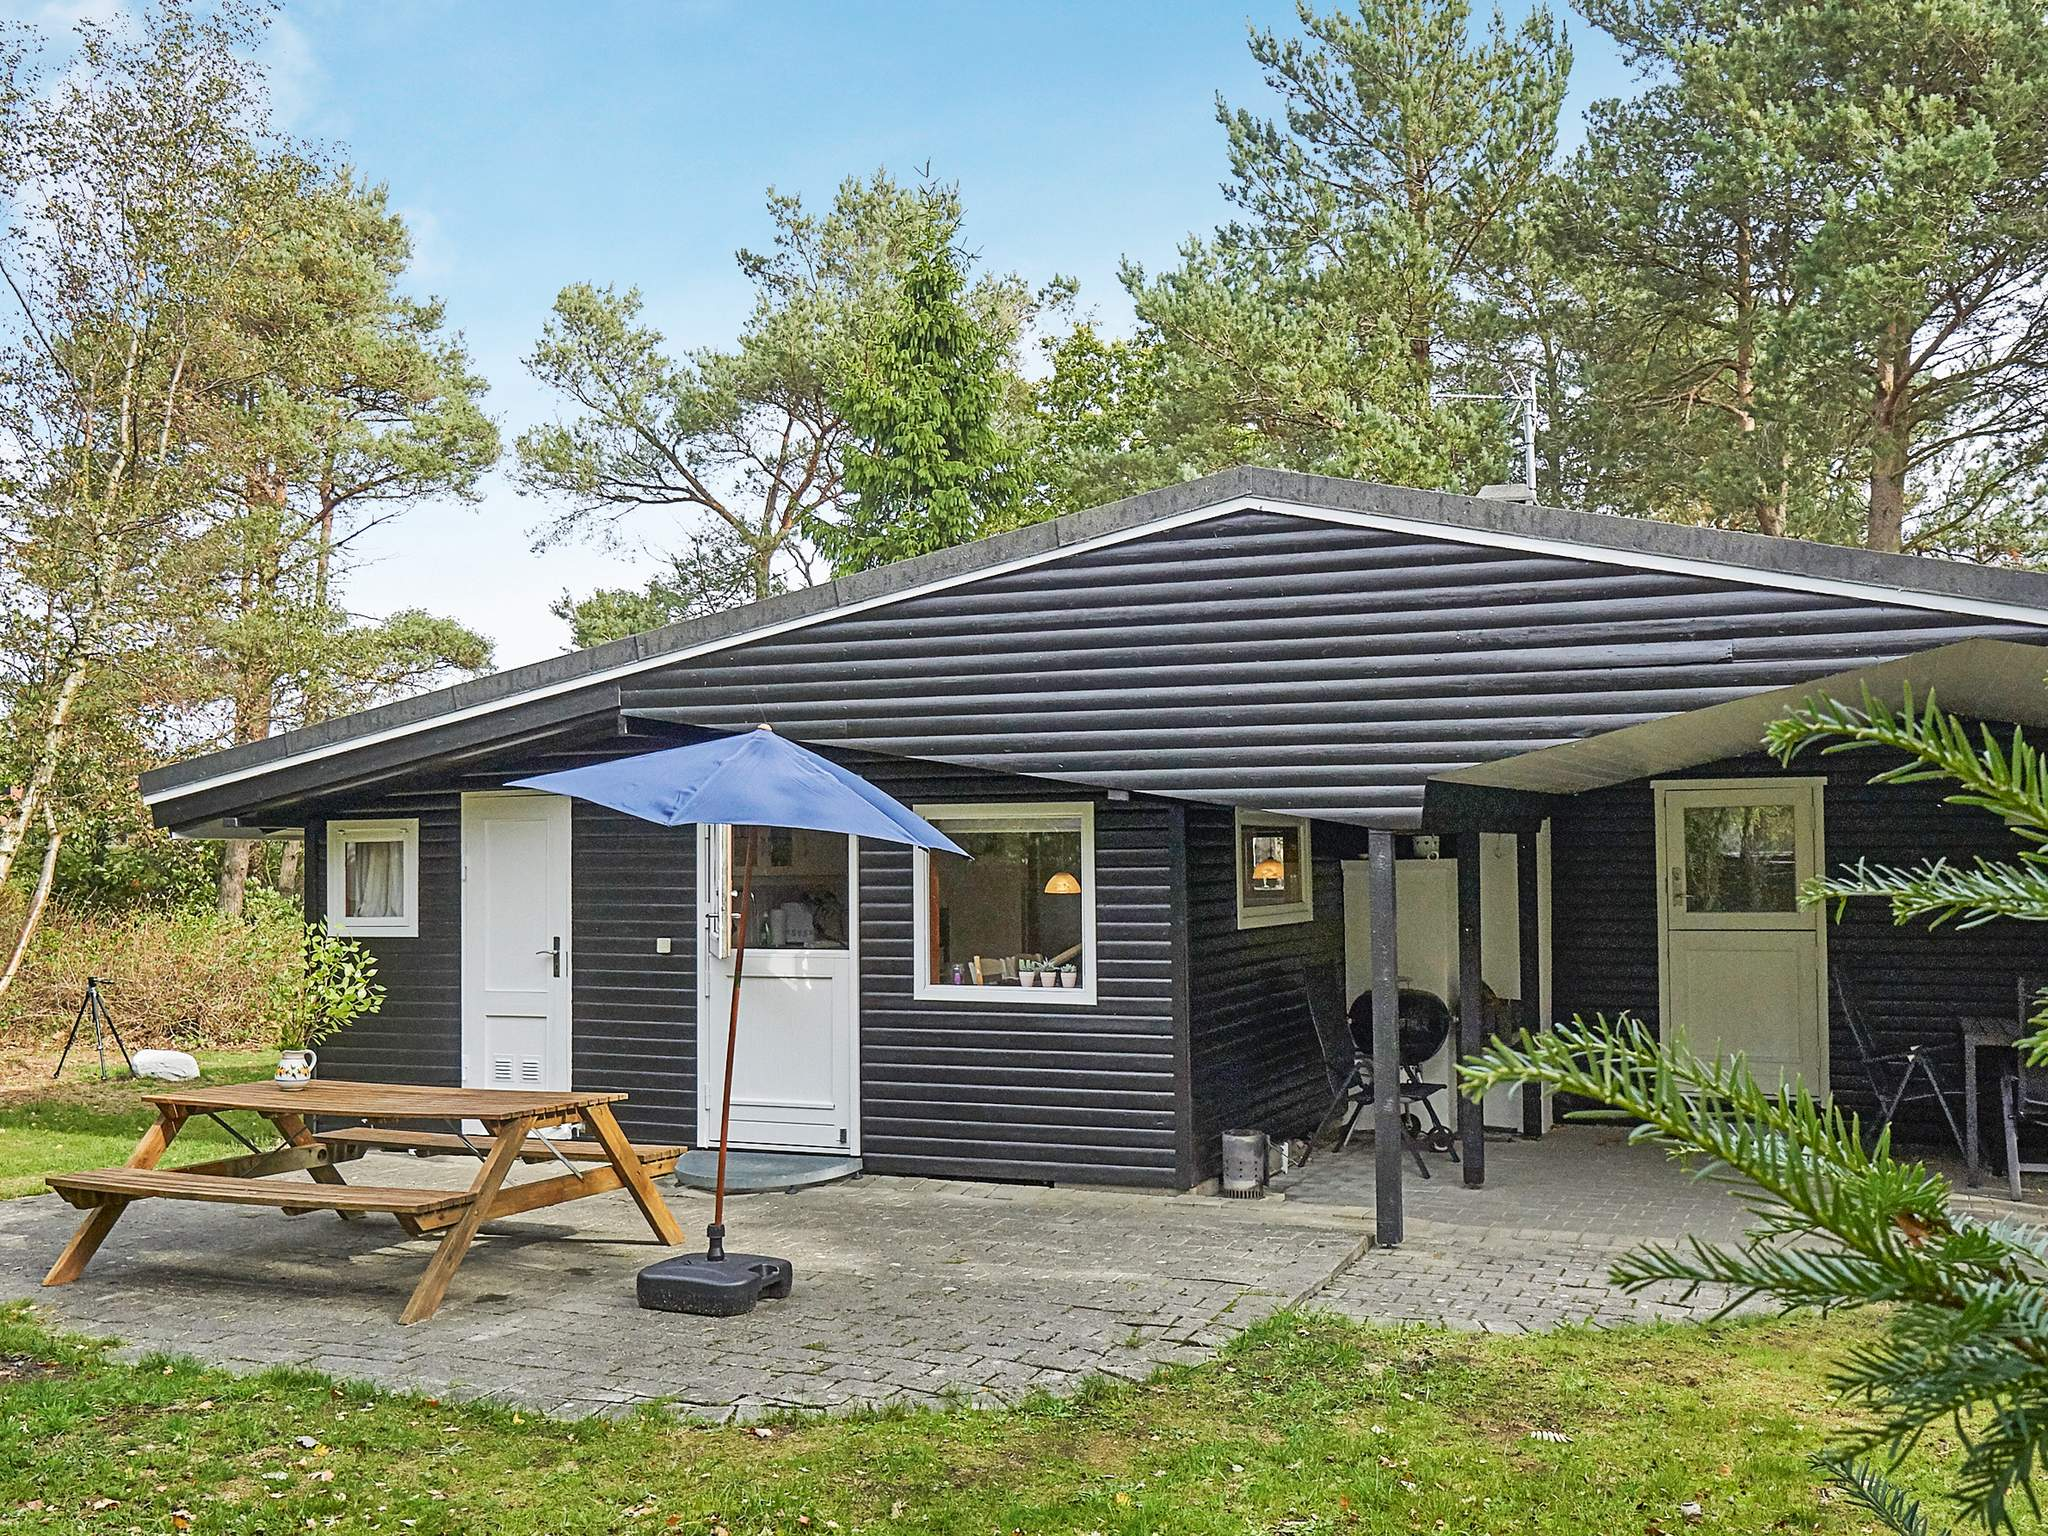 Ferienhaus Balka Strand (2523839), Balke, , Bornholm, Dänemark, Bild 15